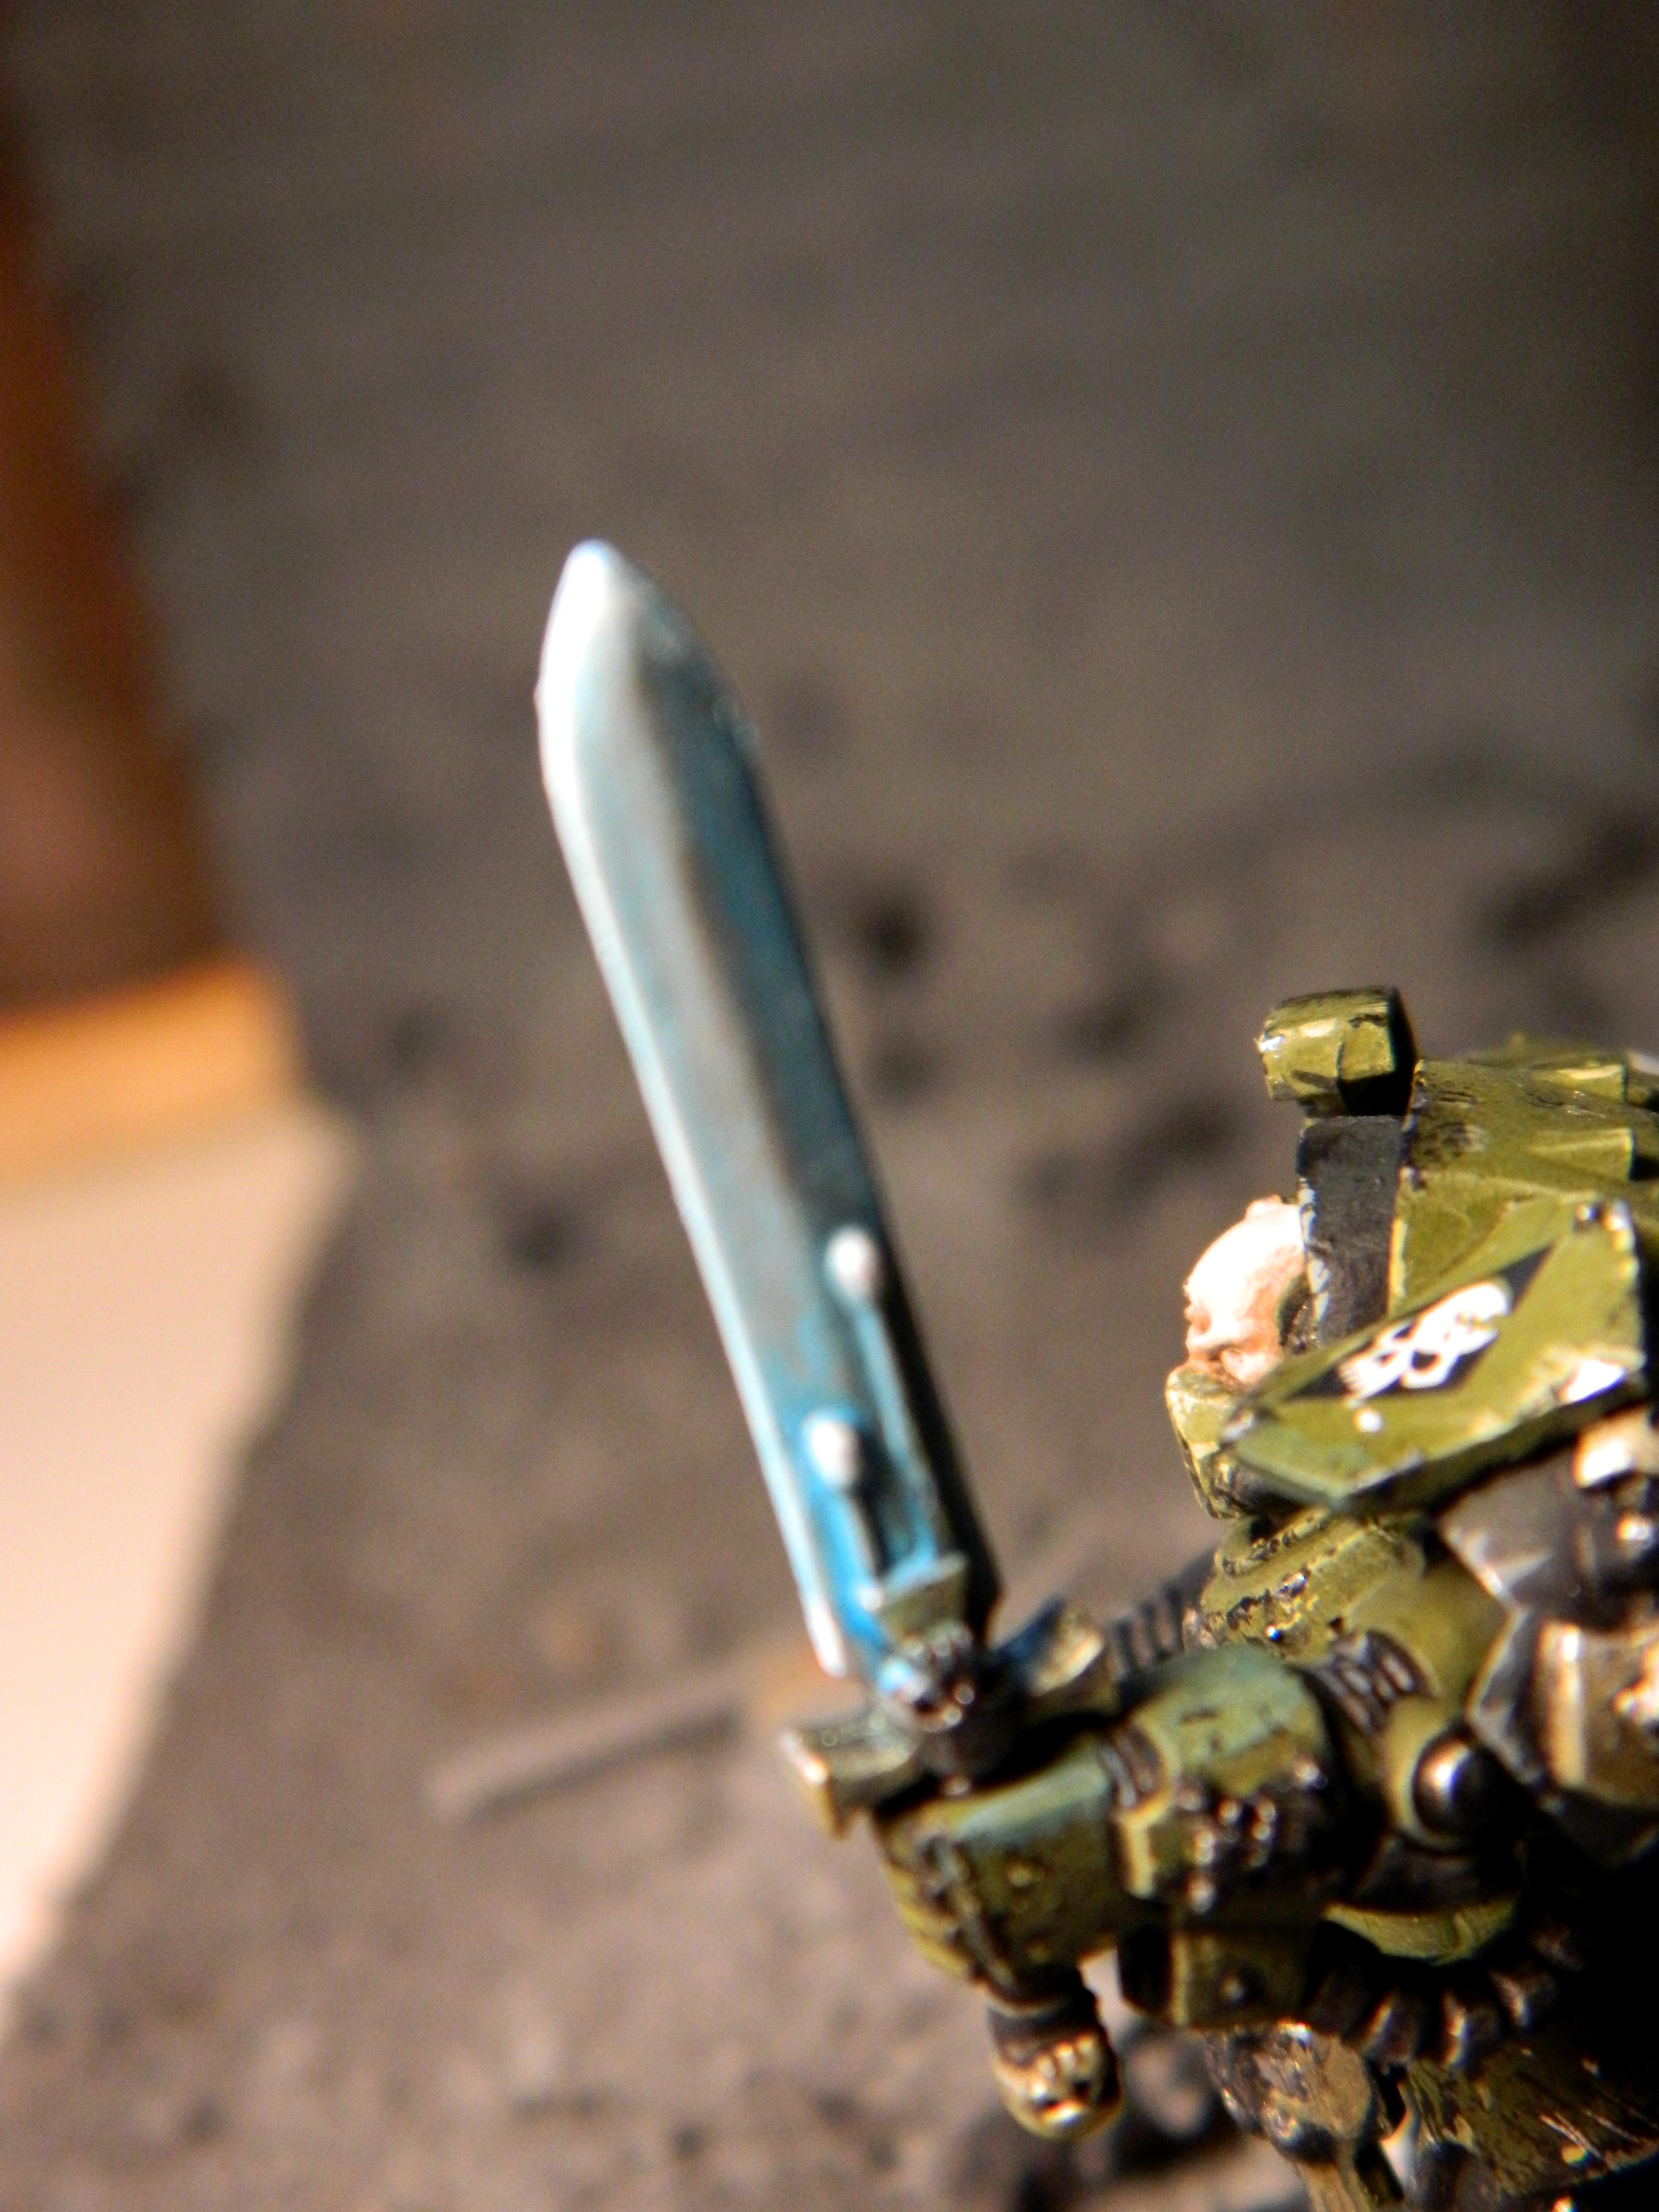 Deathwing, Tda, Terminator Armor, Terminator Sgt